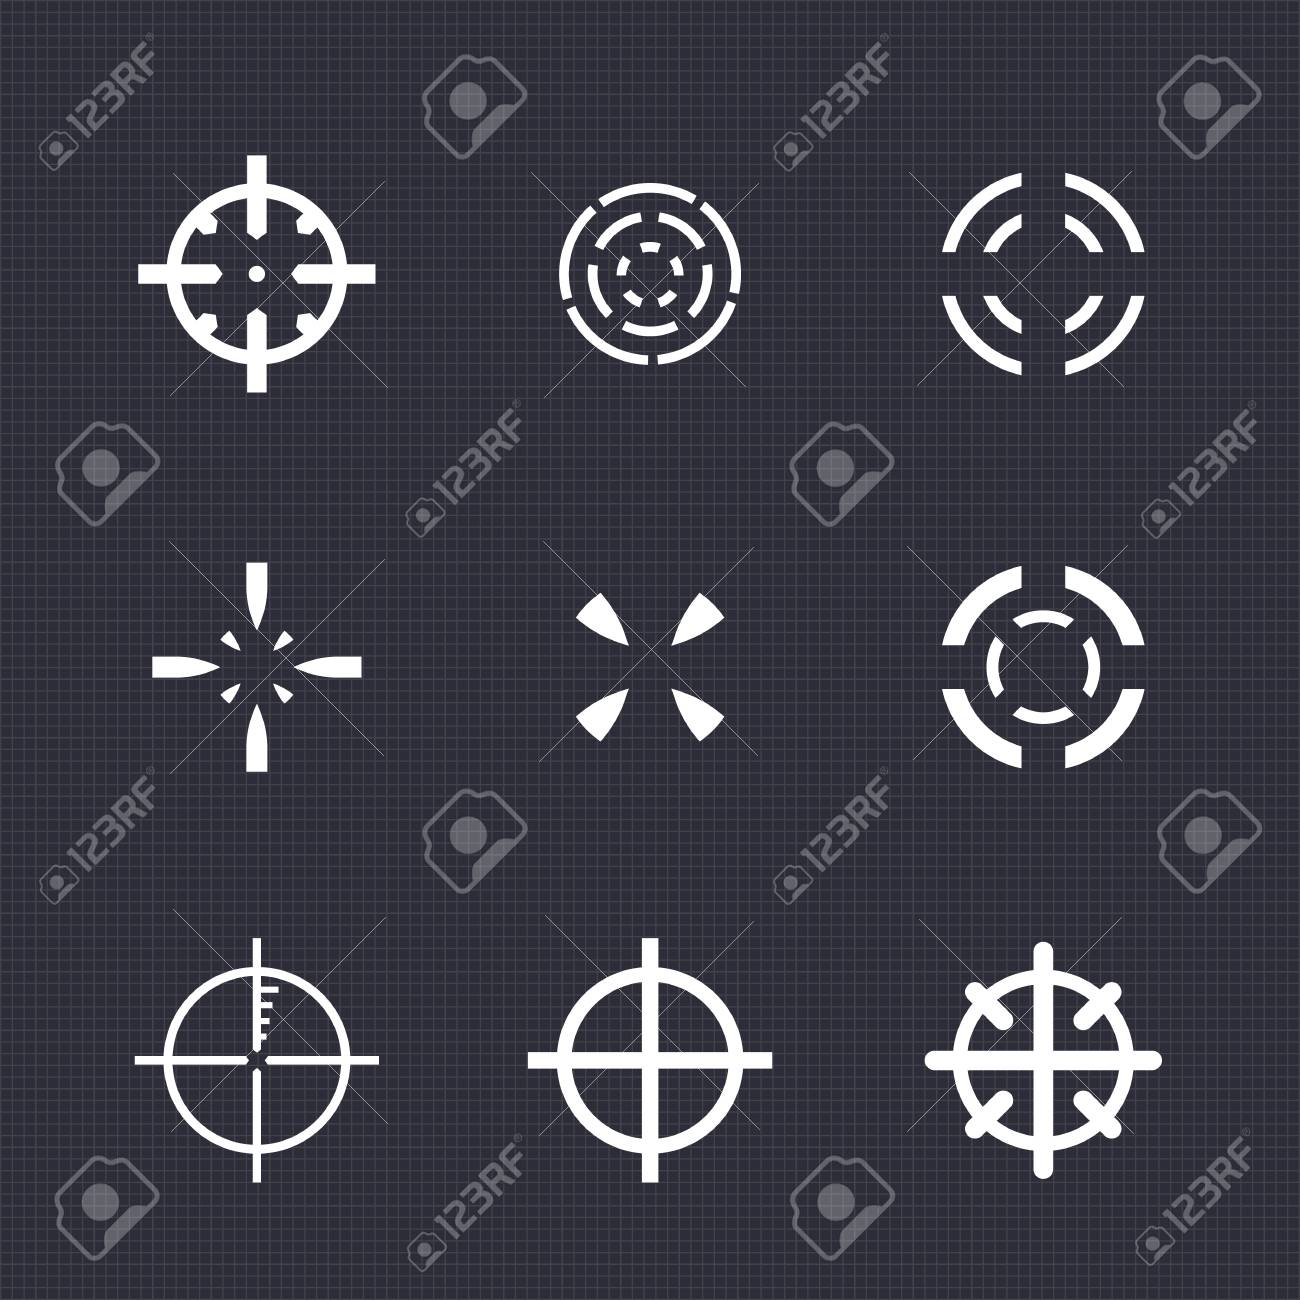 Crosshairs Set Elements For Game Design White On Dark Stock Vector 69815237